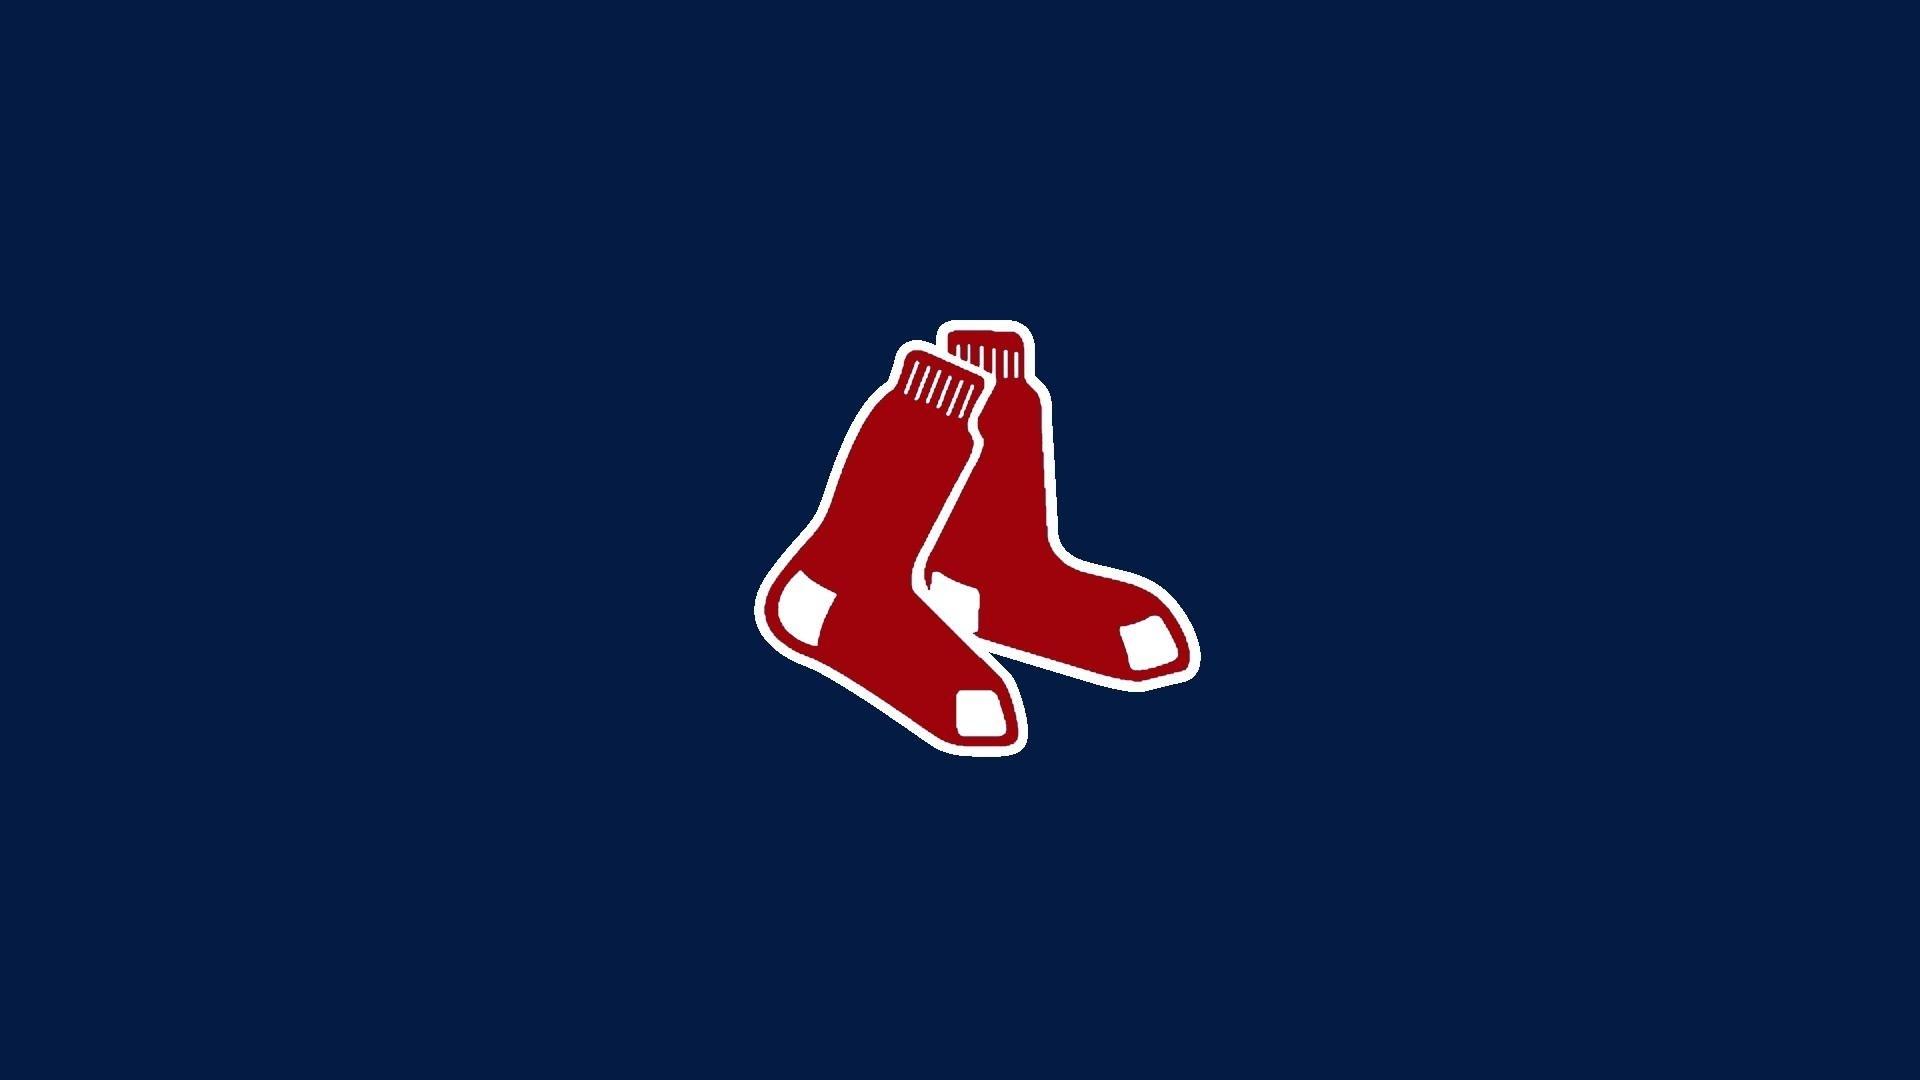 boston red sox logo wallpaper | (84497)